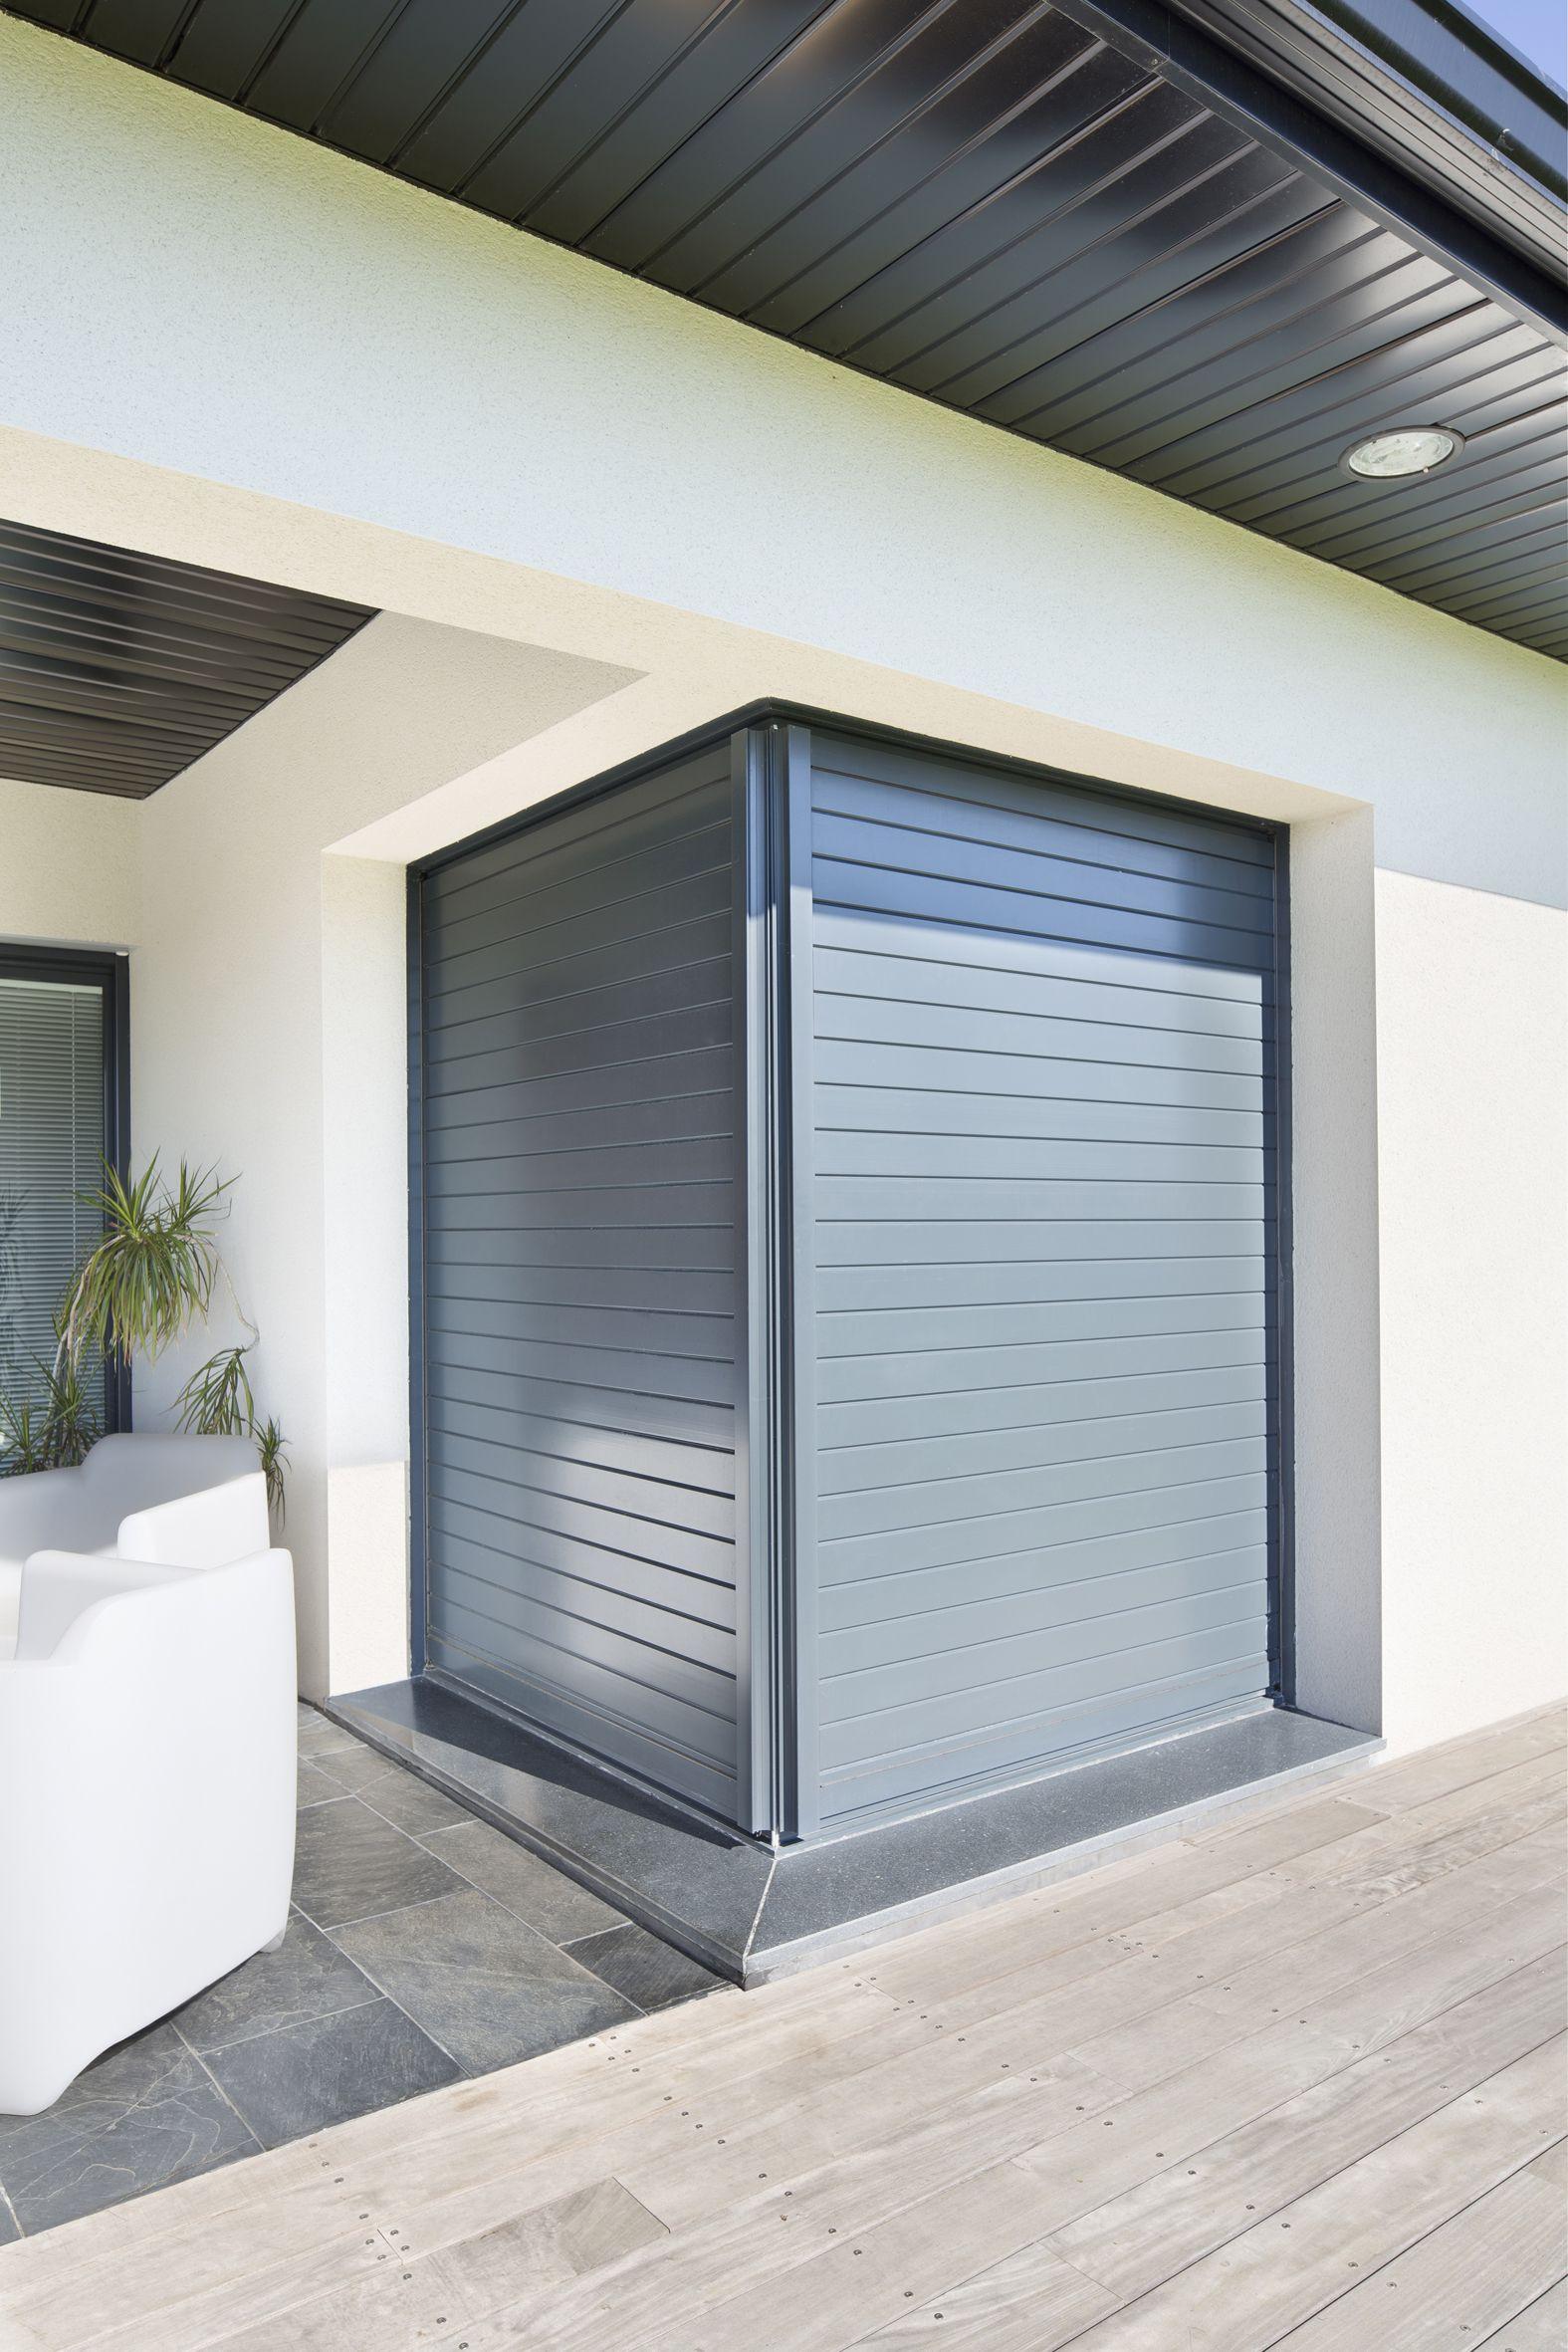 bloc coulissant galandage d 39 angle an aluminium d 39 initial. Black Bedroom Furniture Sets. Home Design Ideas